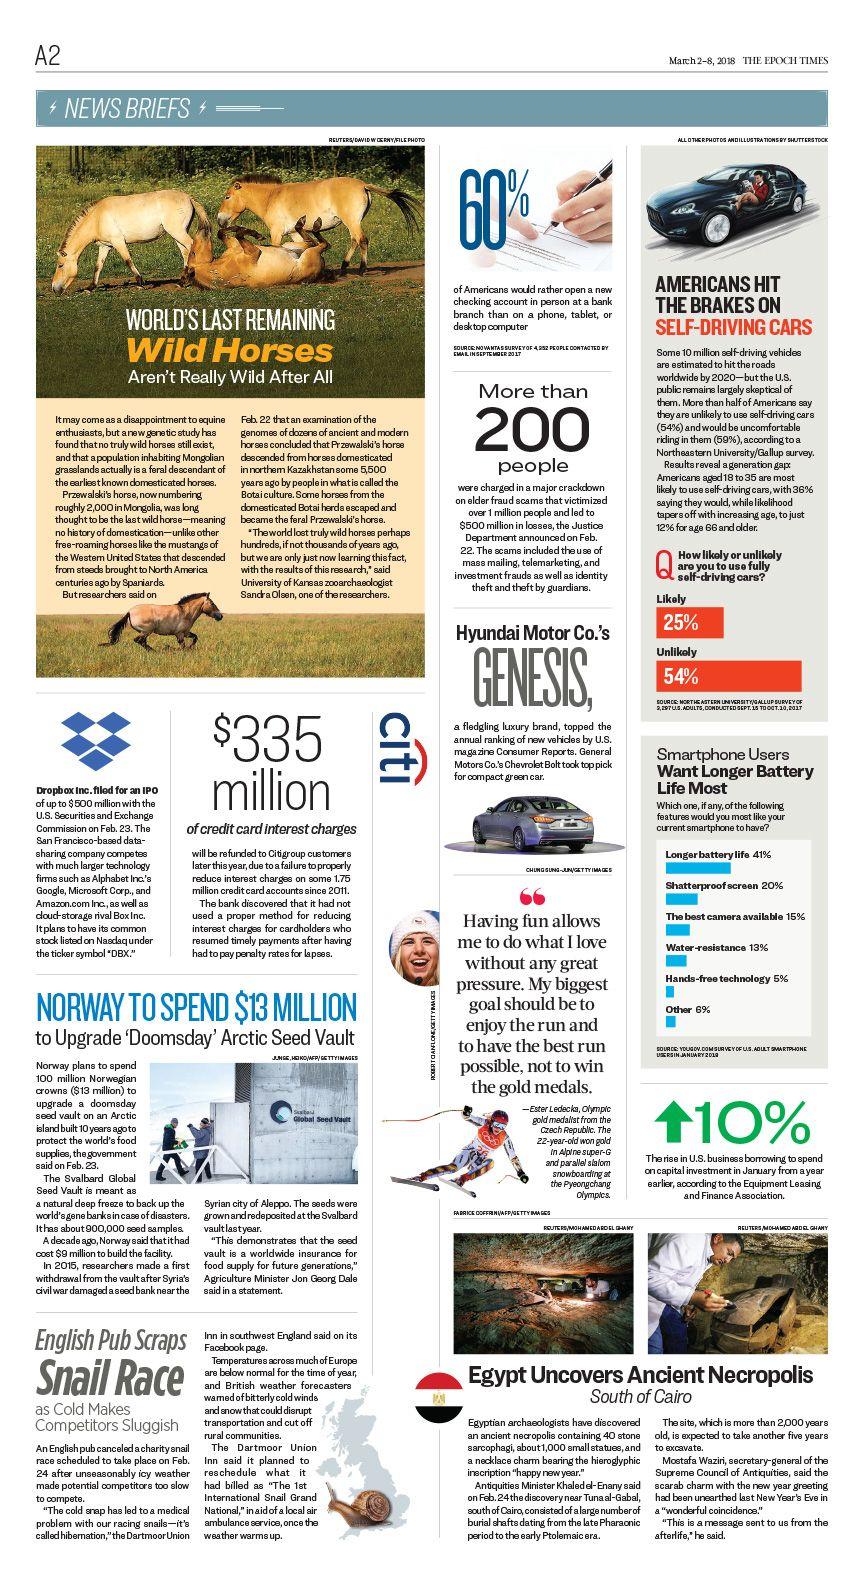 News briefsthe epoch times theweekinbrief newspaper news briefsthe epoch times theweekinbrief newspaper editorialdesign biocorpaavc Gallery